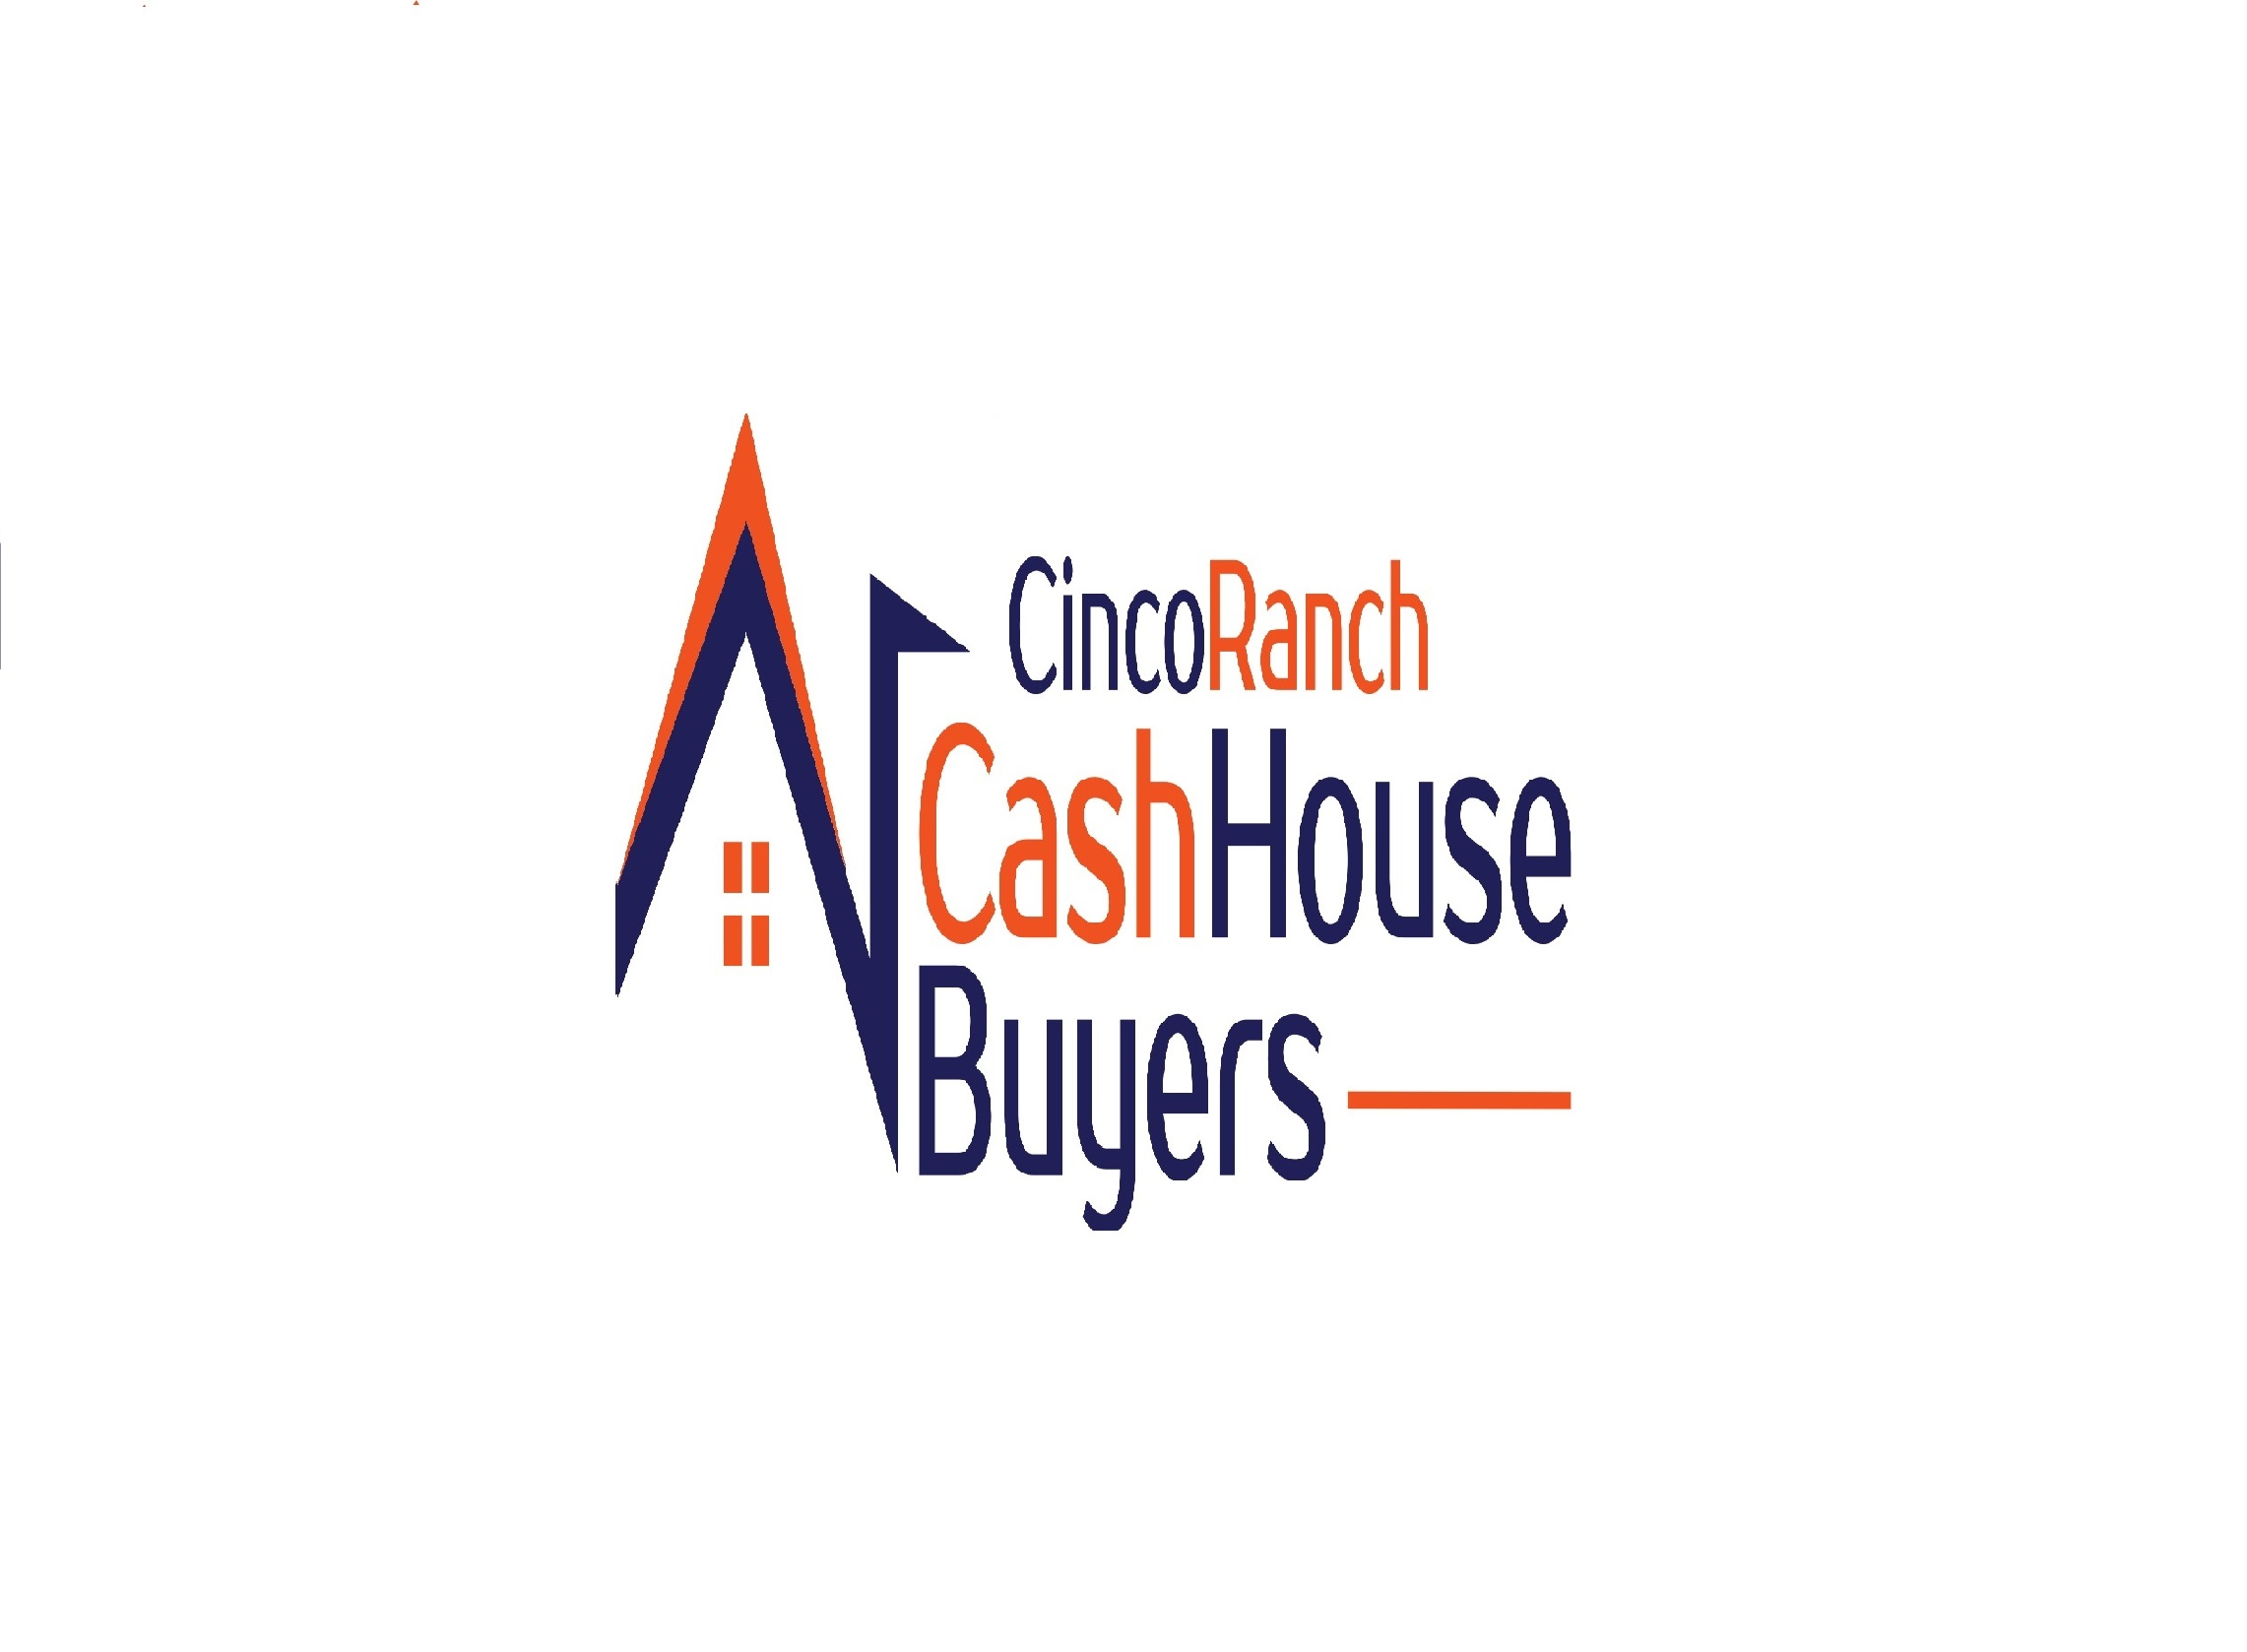 Cinco Ranch Cash House Buyers